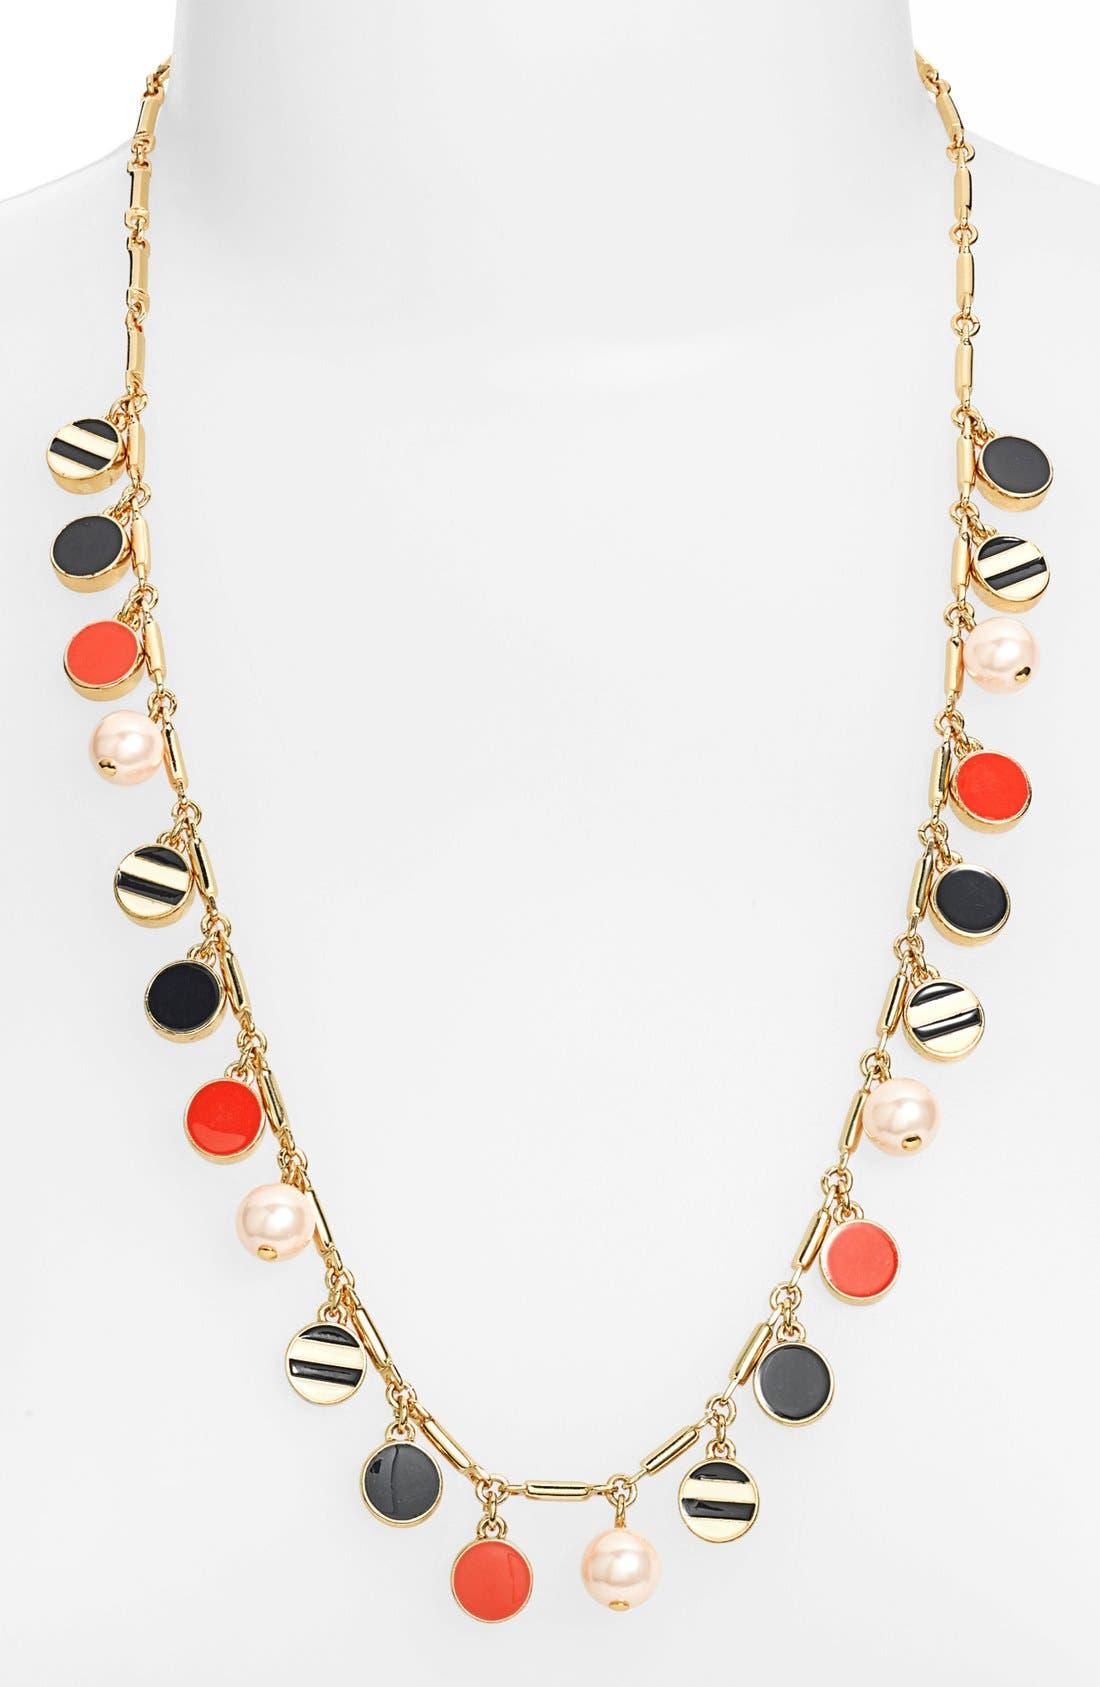 Main Image - kate spade new york 'spot the shore' enamel & faux pearl long necklace